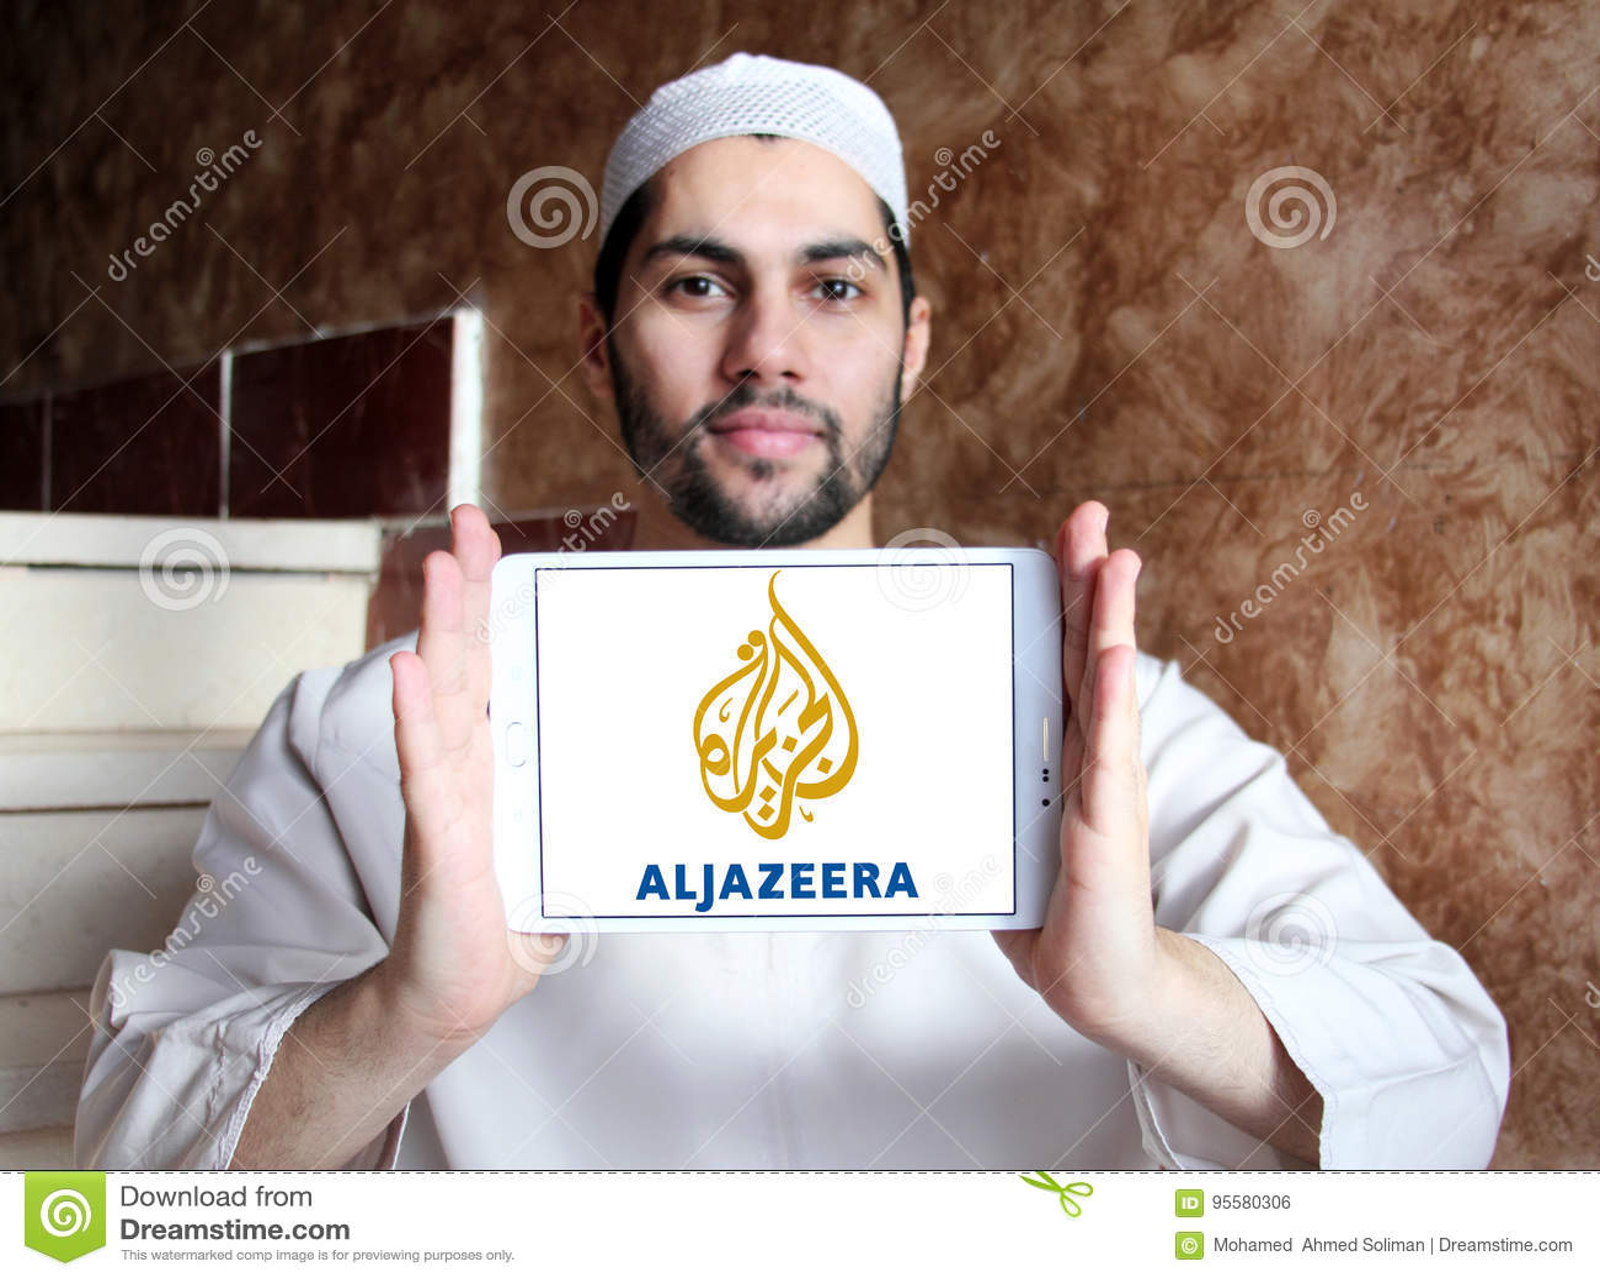 Aljazeera news channel logo